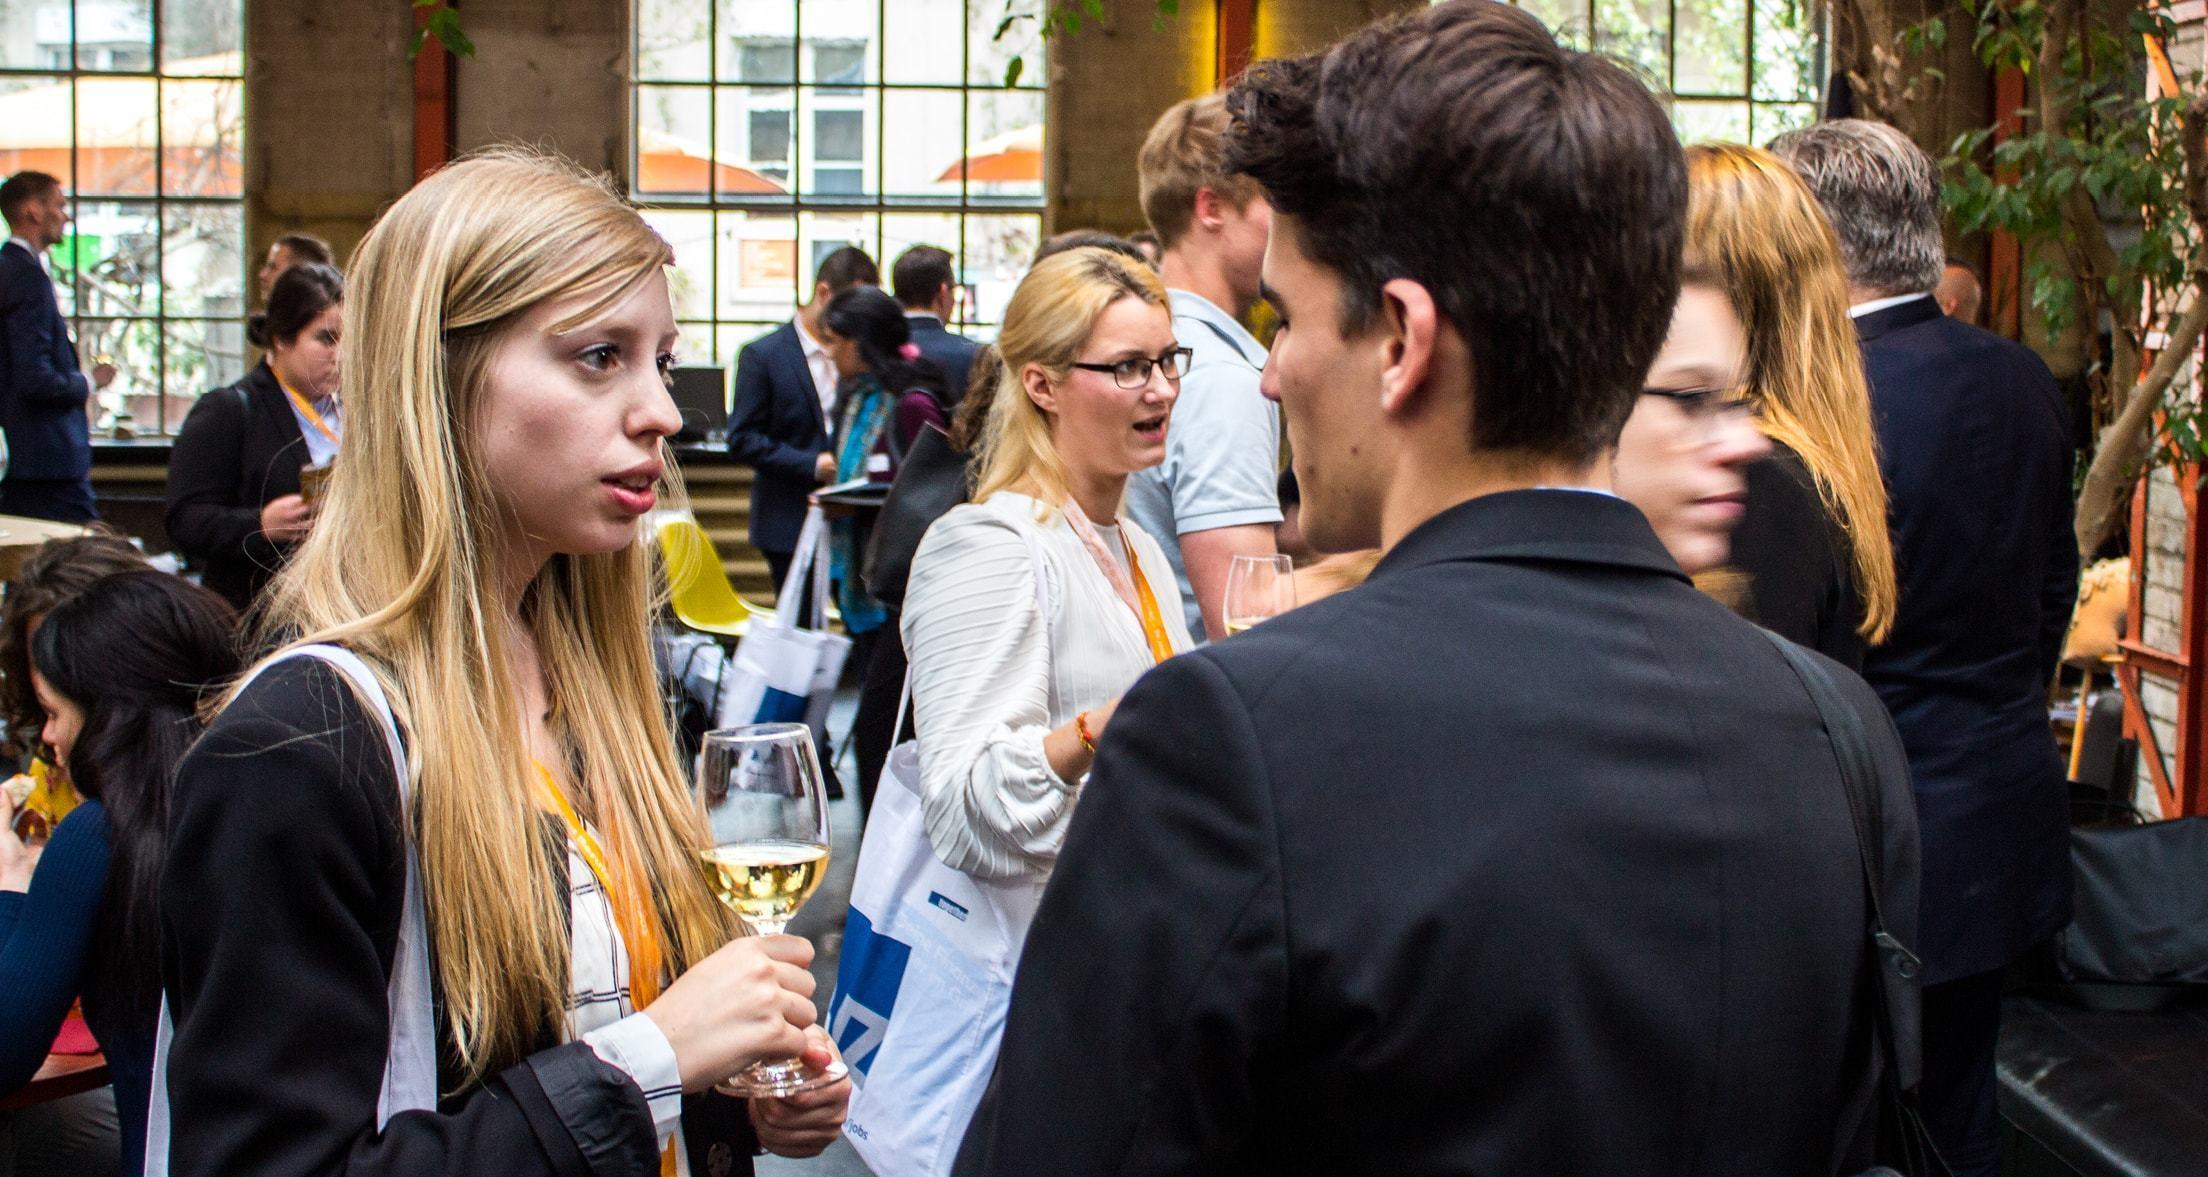 Sprungbrett-Event Basel